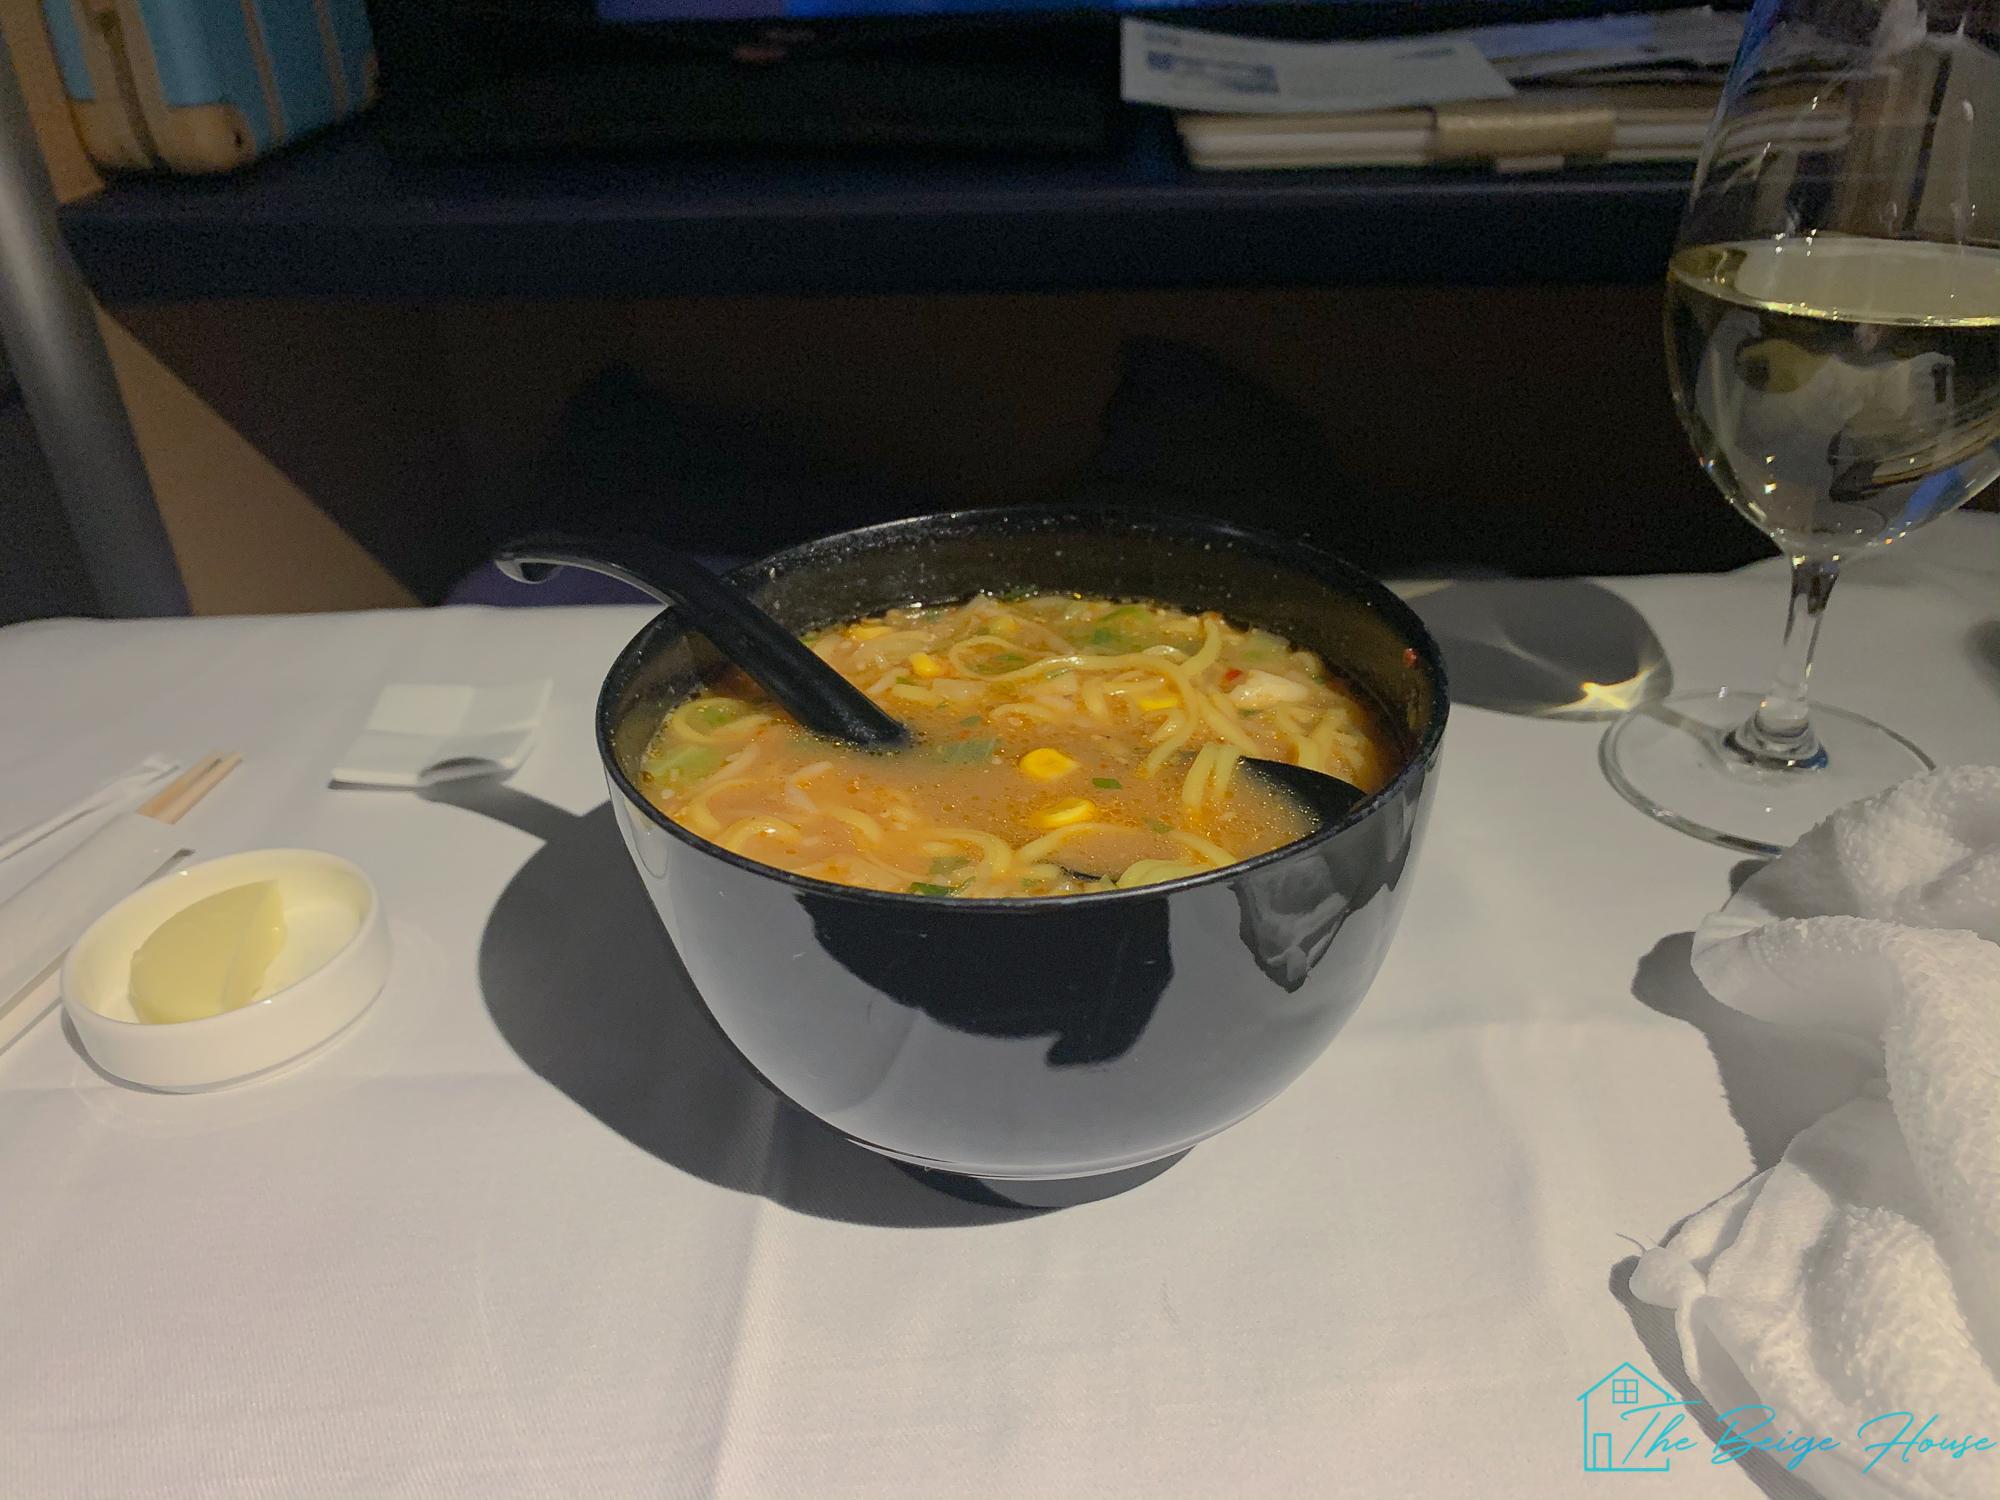 ANA Flight O'Hare to Narita Review